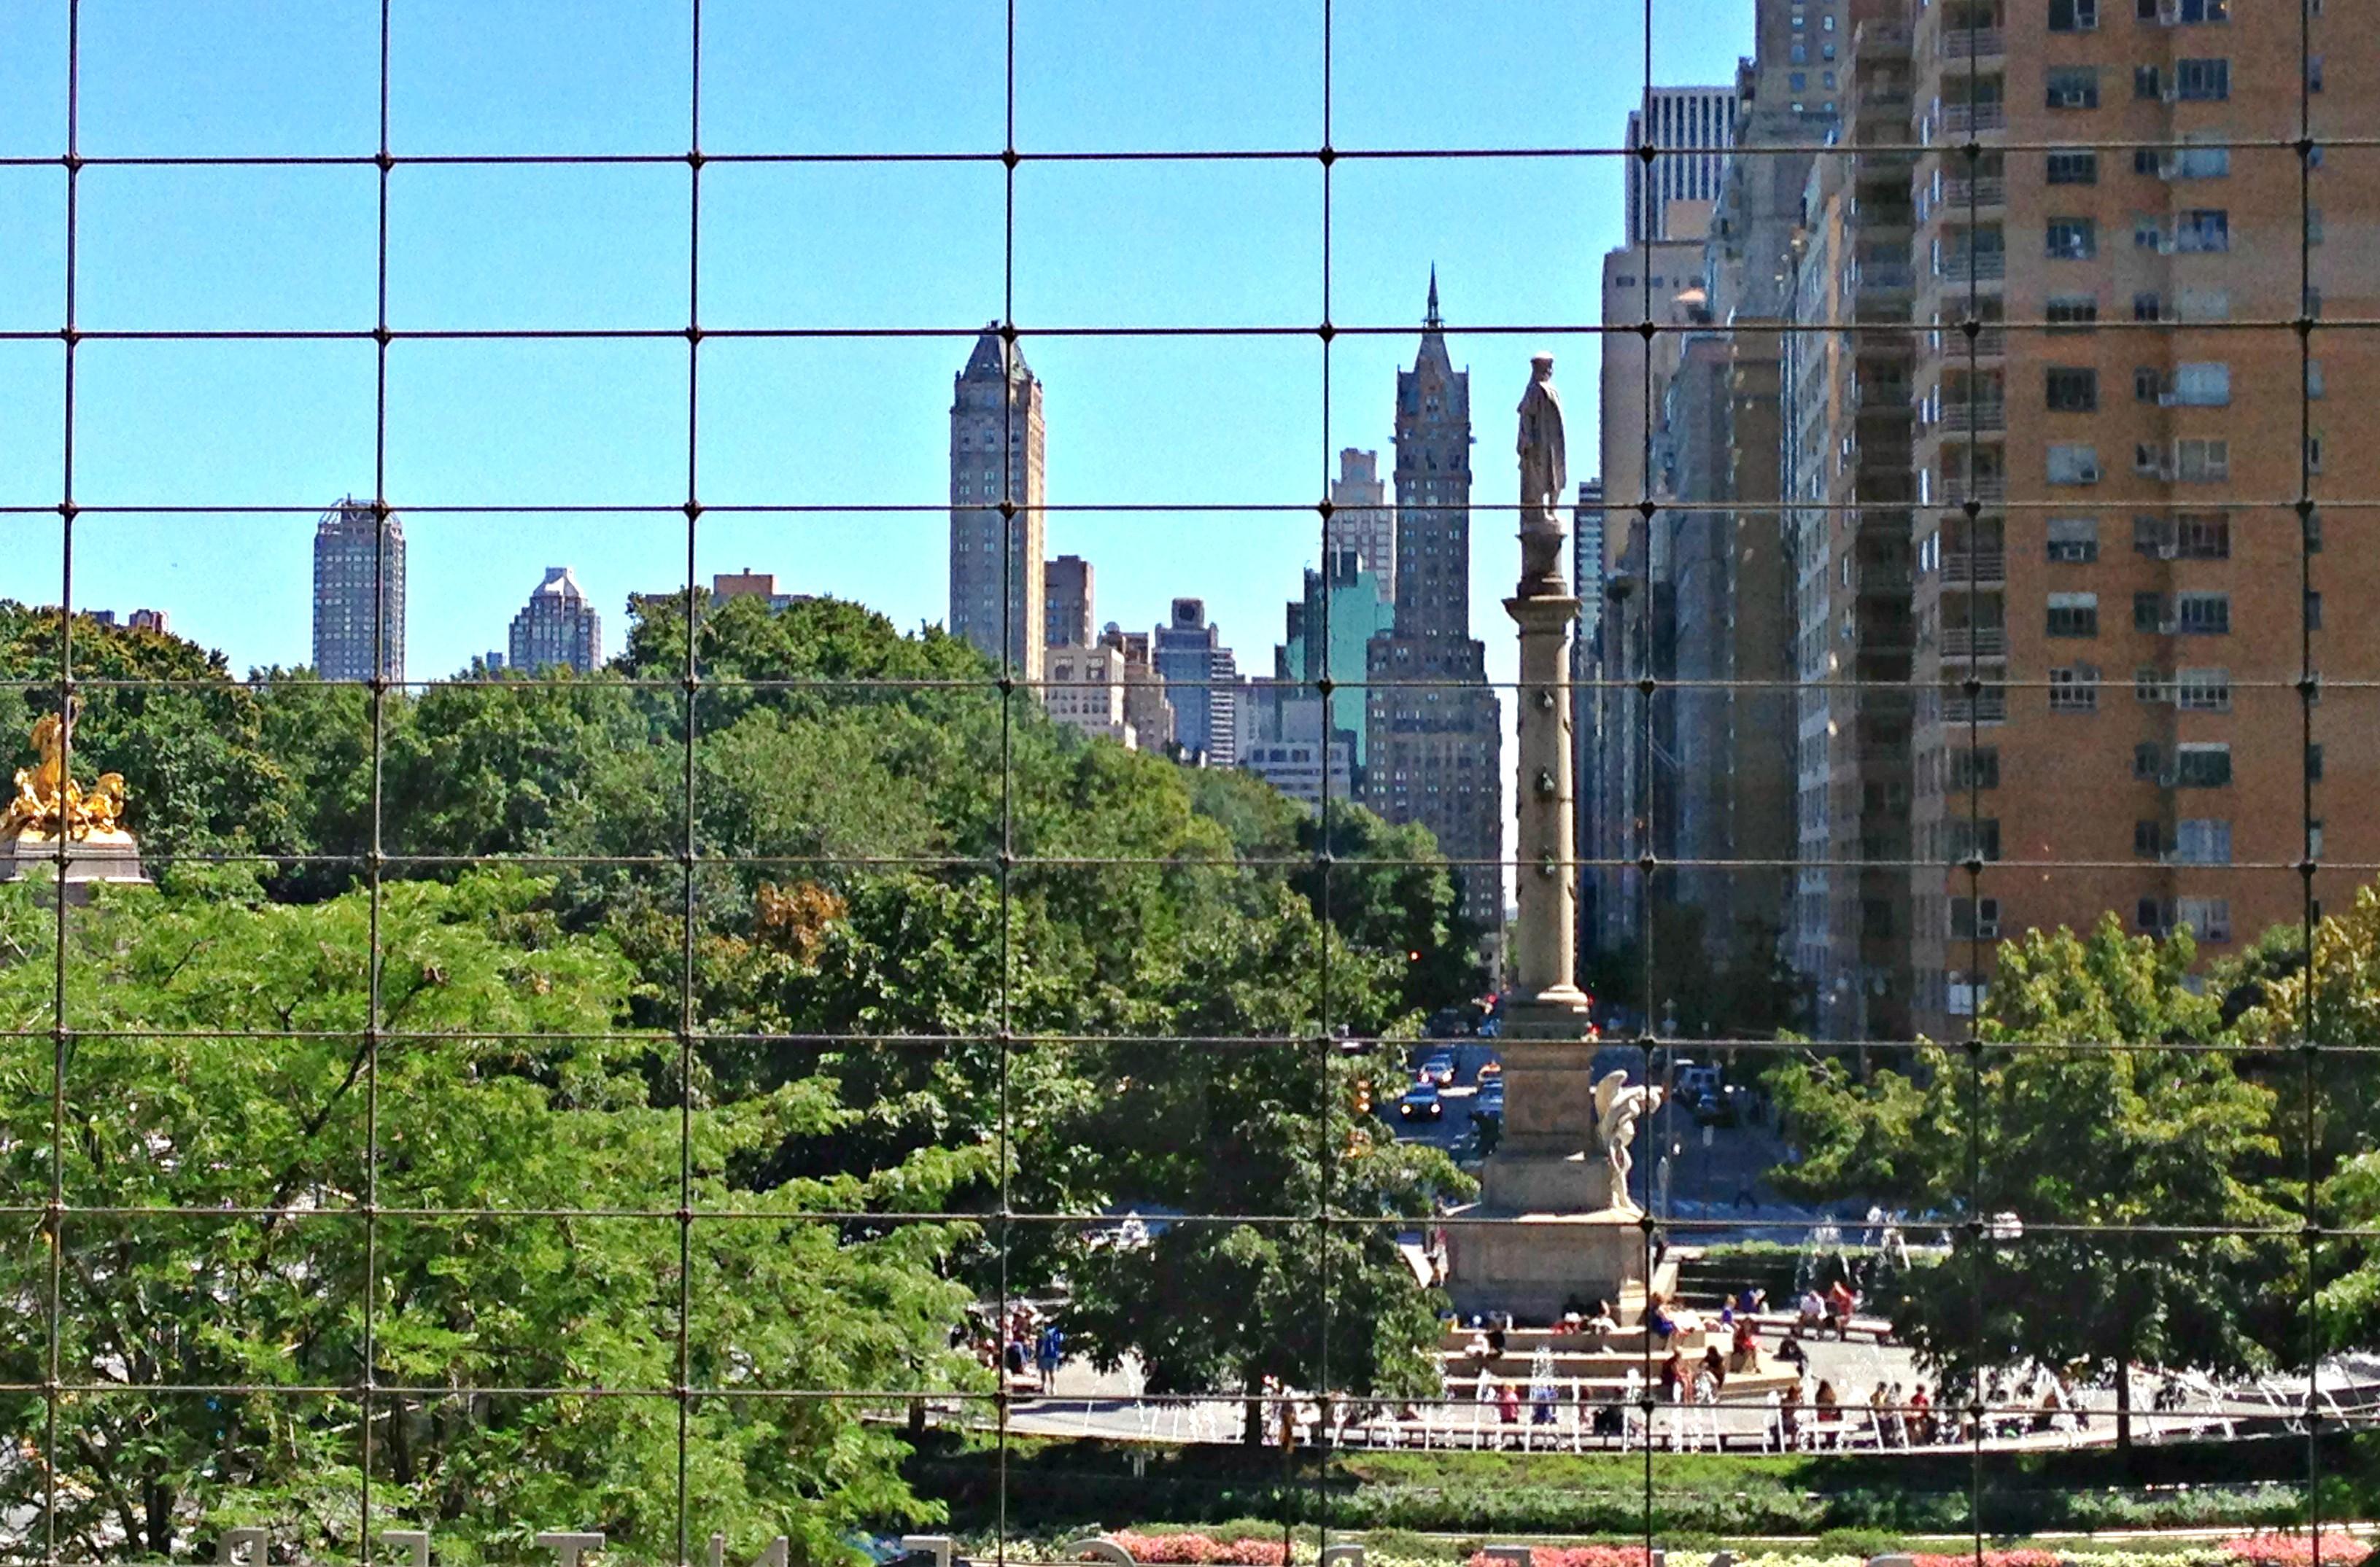 Columbus Statue NYC Beitrag 2